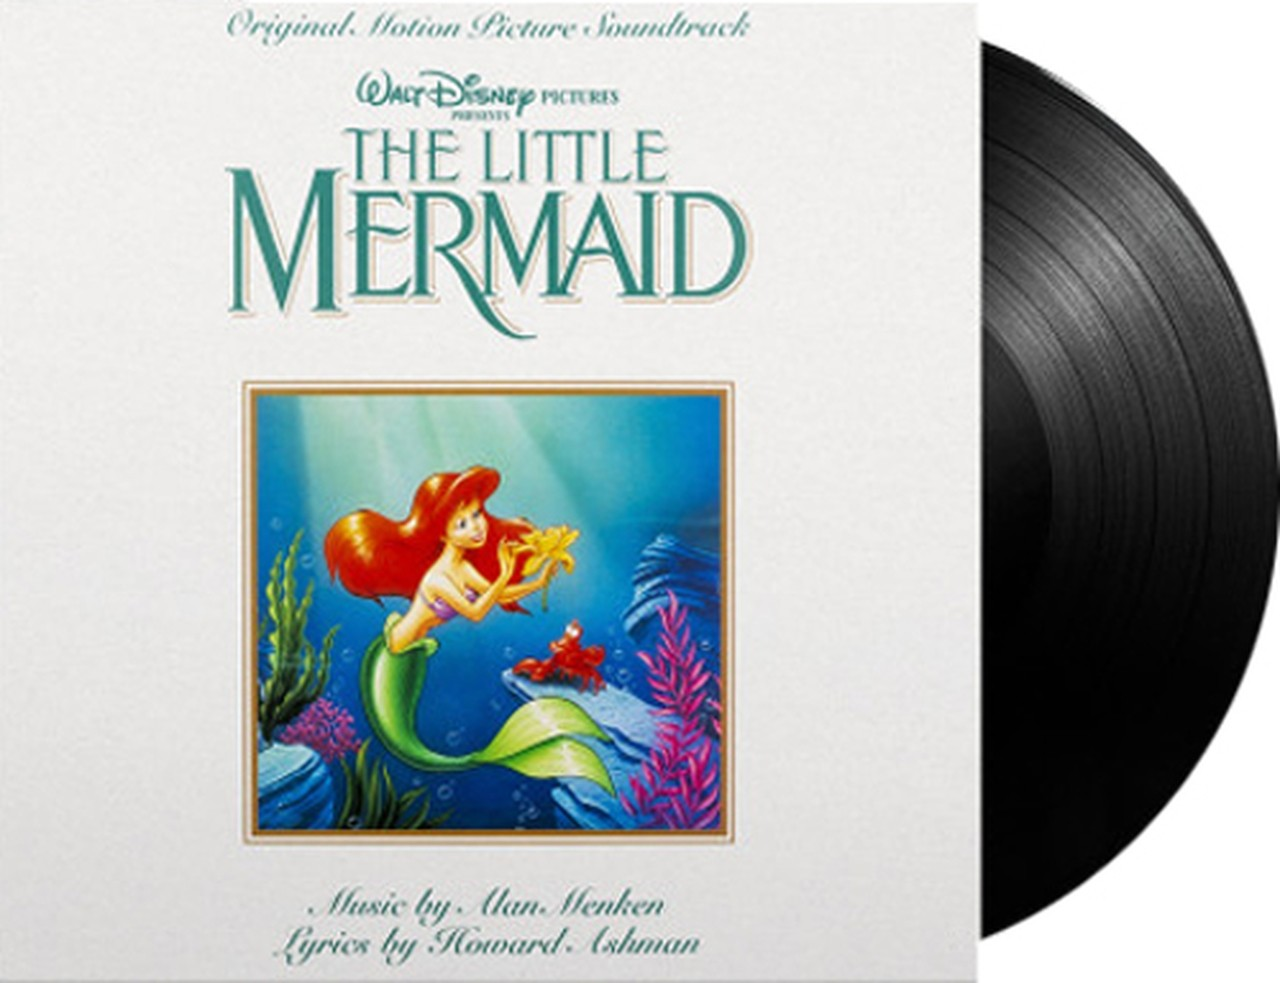 Soundtrack - The Little Mermaid Vinyl LP